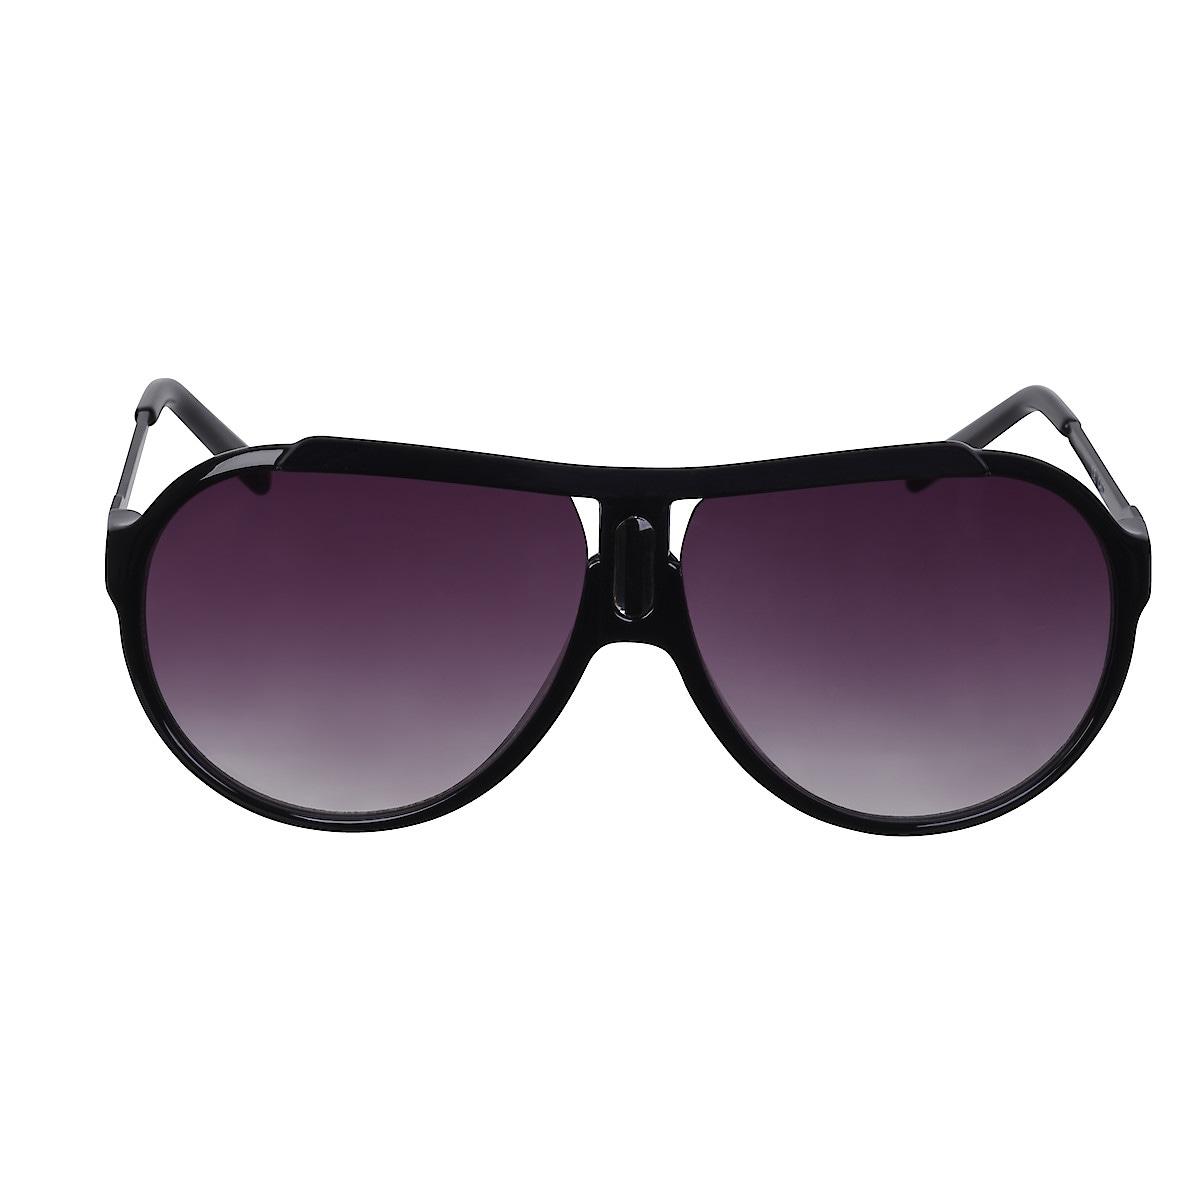 Solglasögon plast/metall